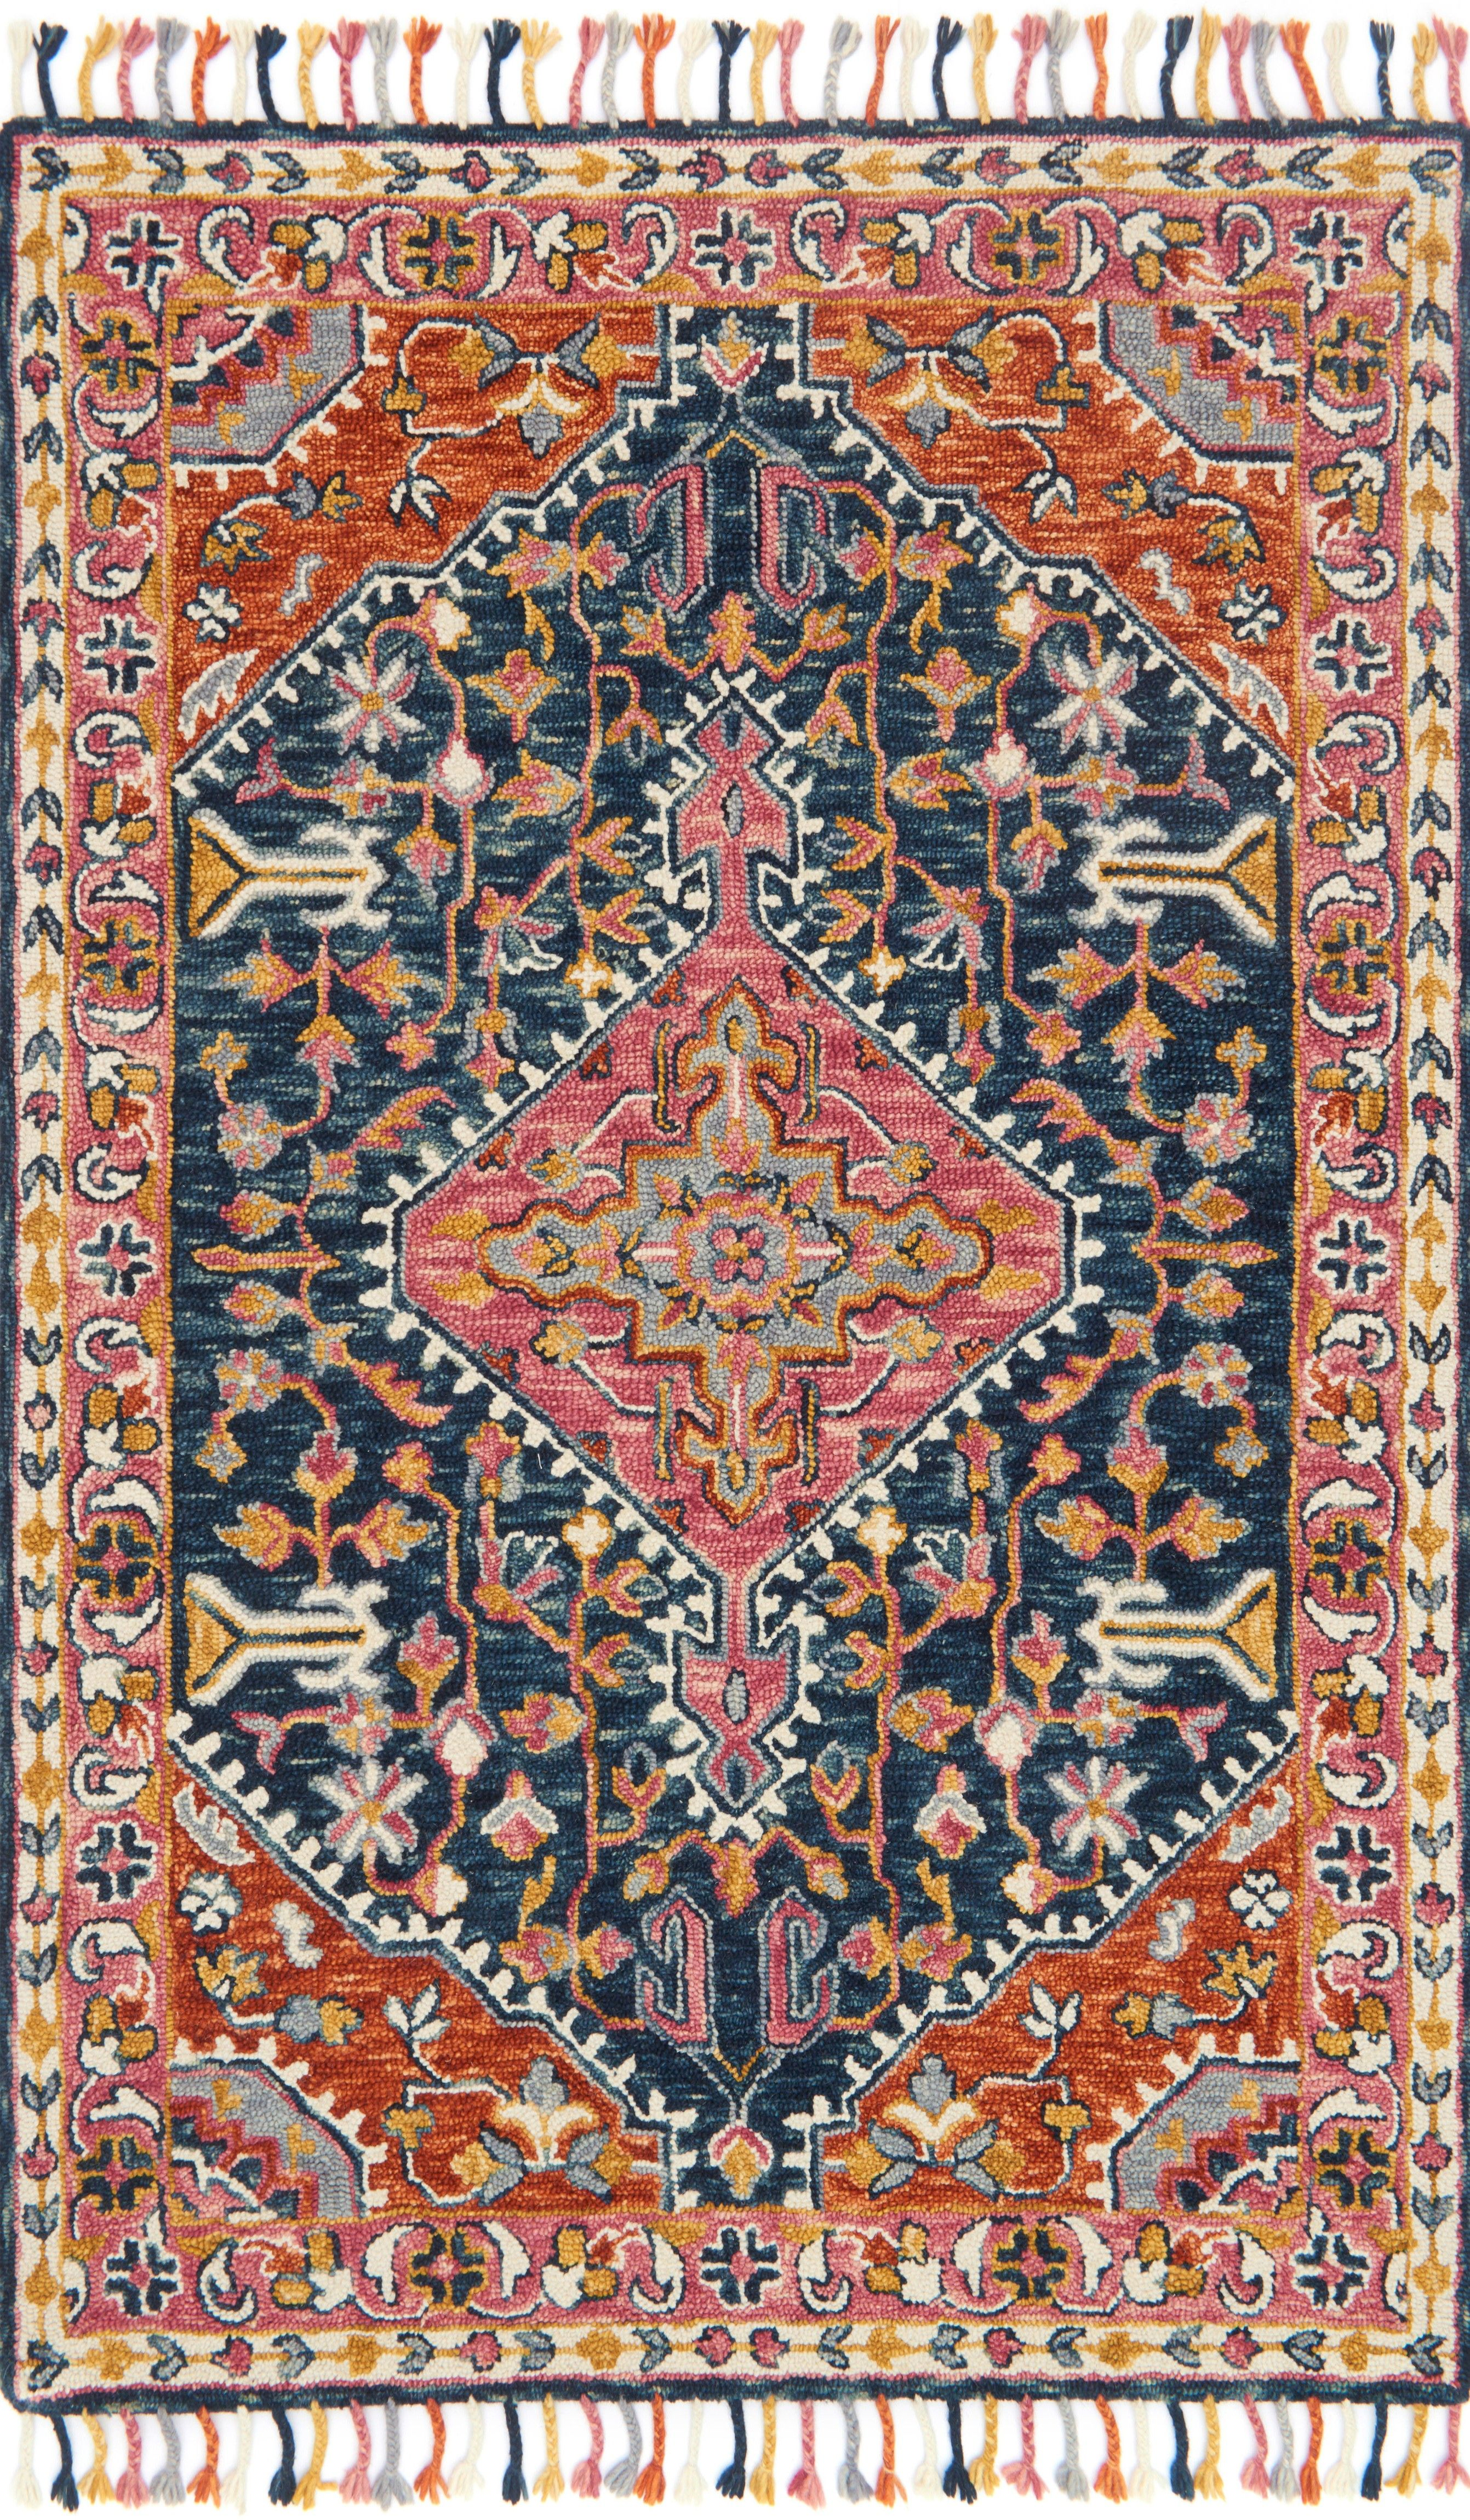 Ede Rug Rugs On Carpet Loloi Rugs Rugs